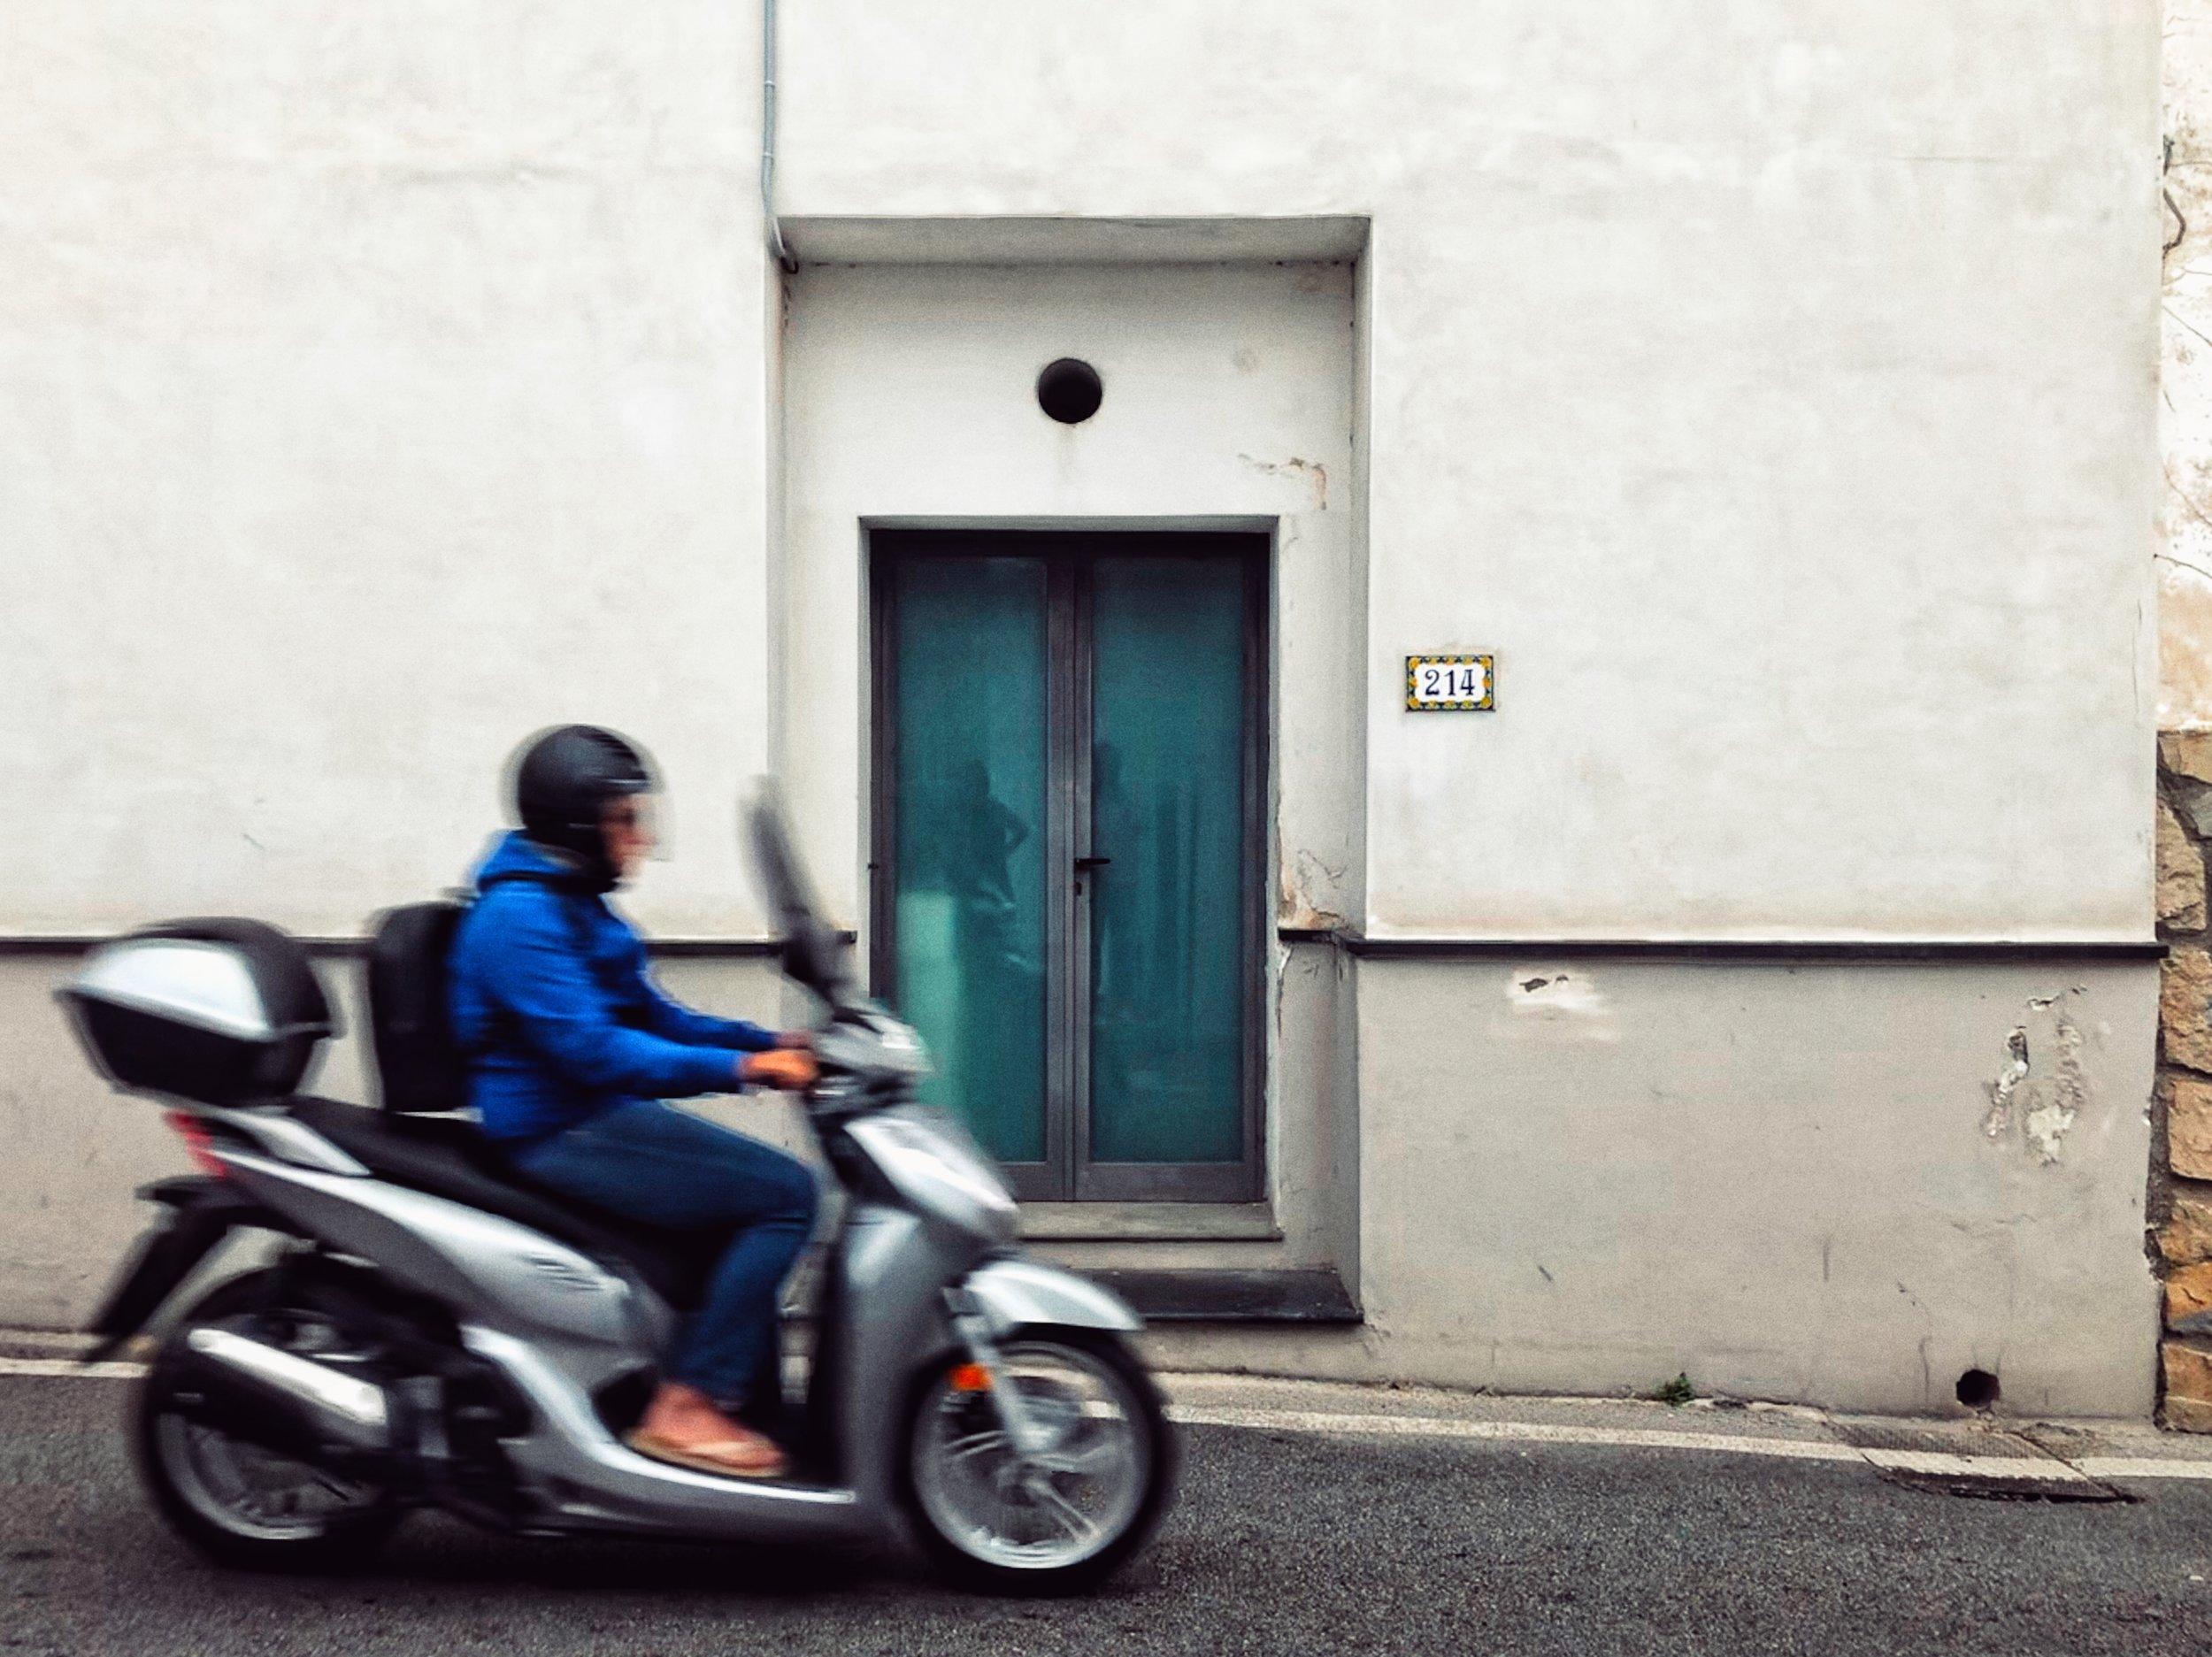 positano-motorbike.jpg